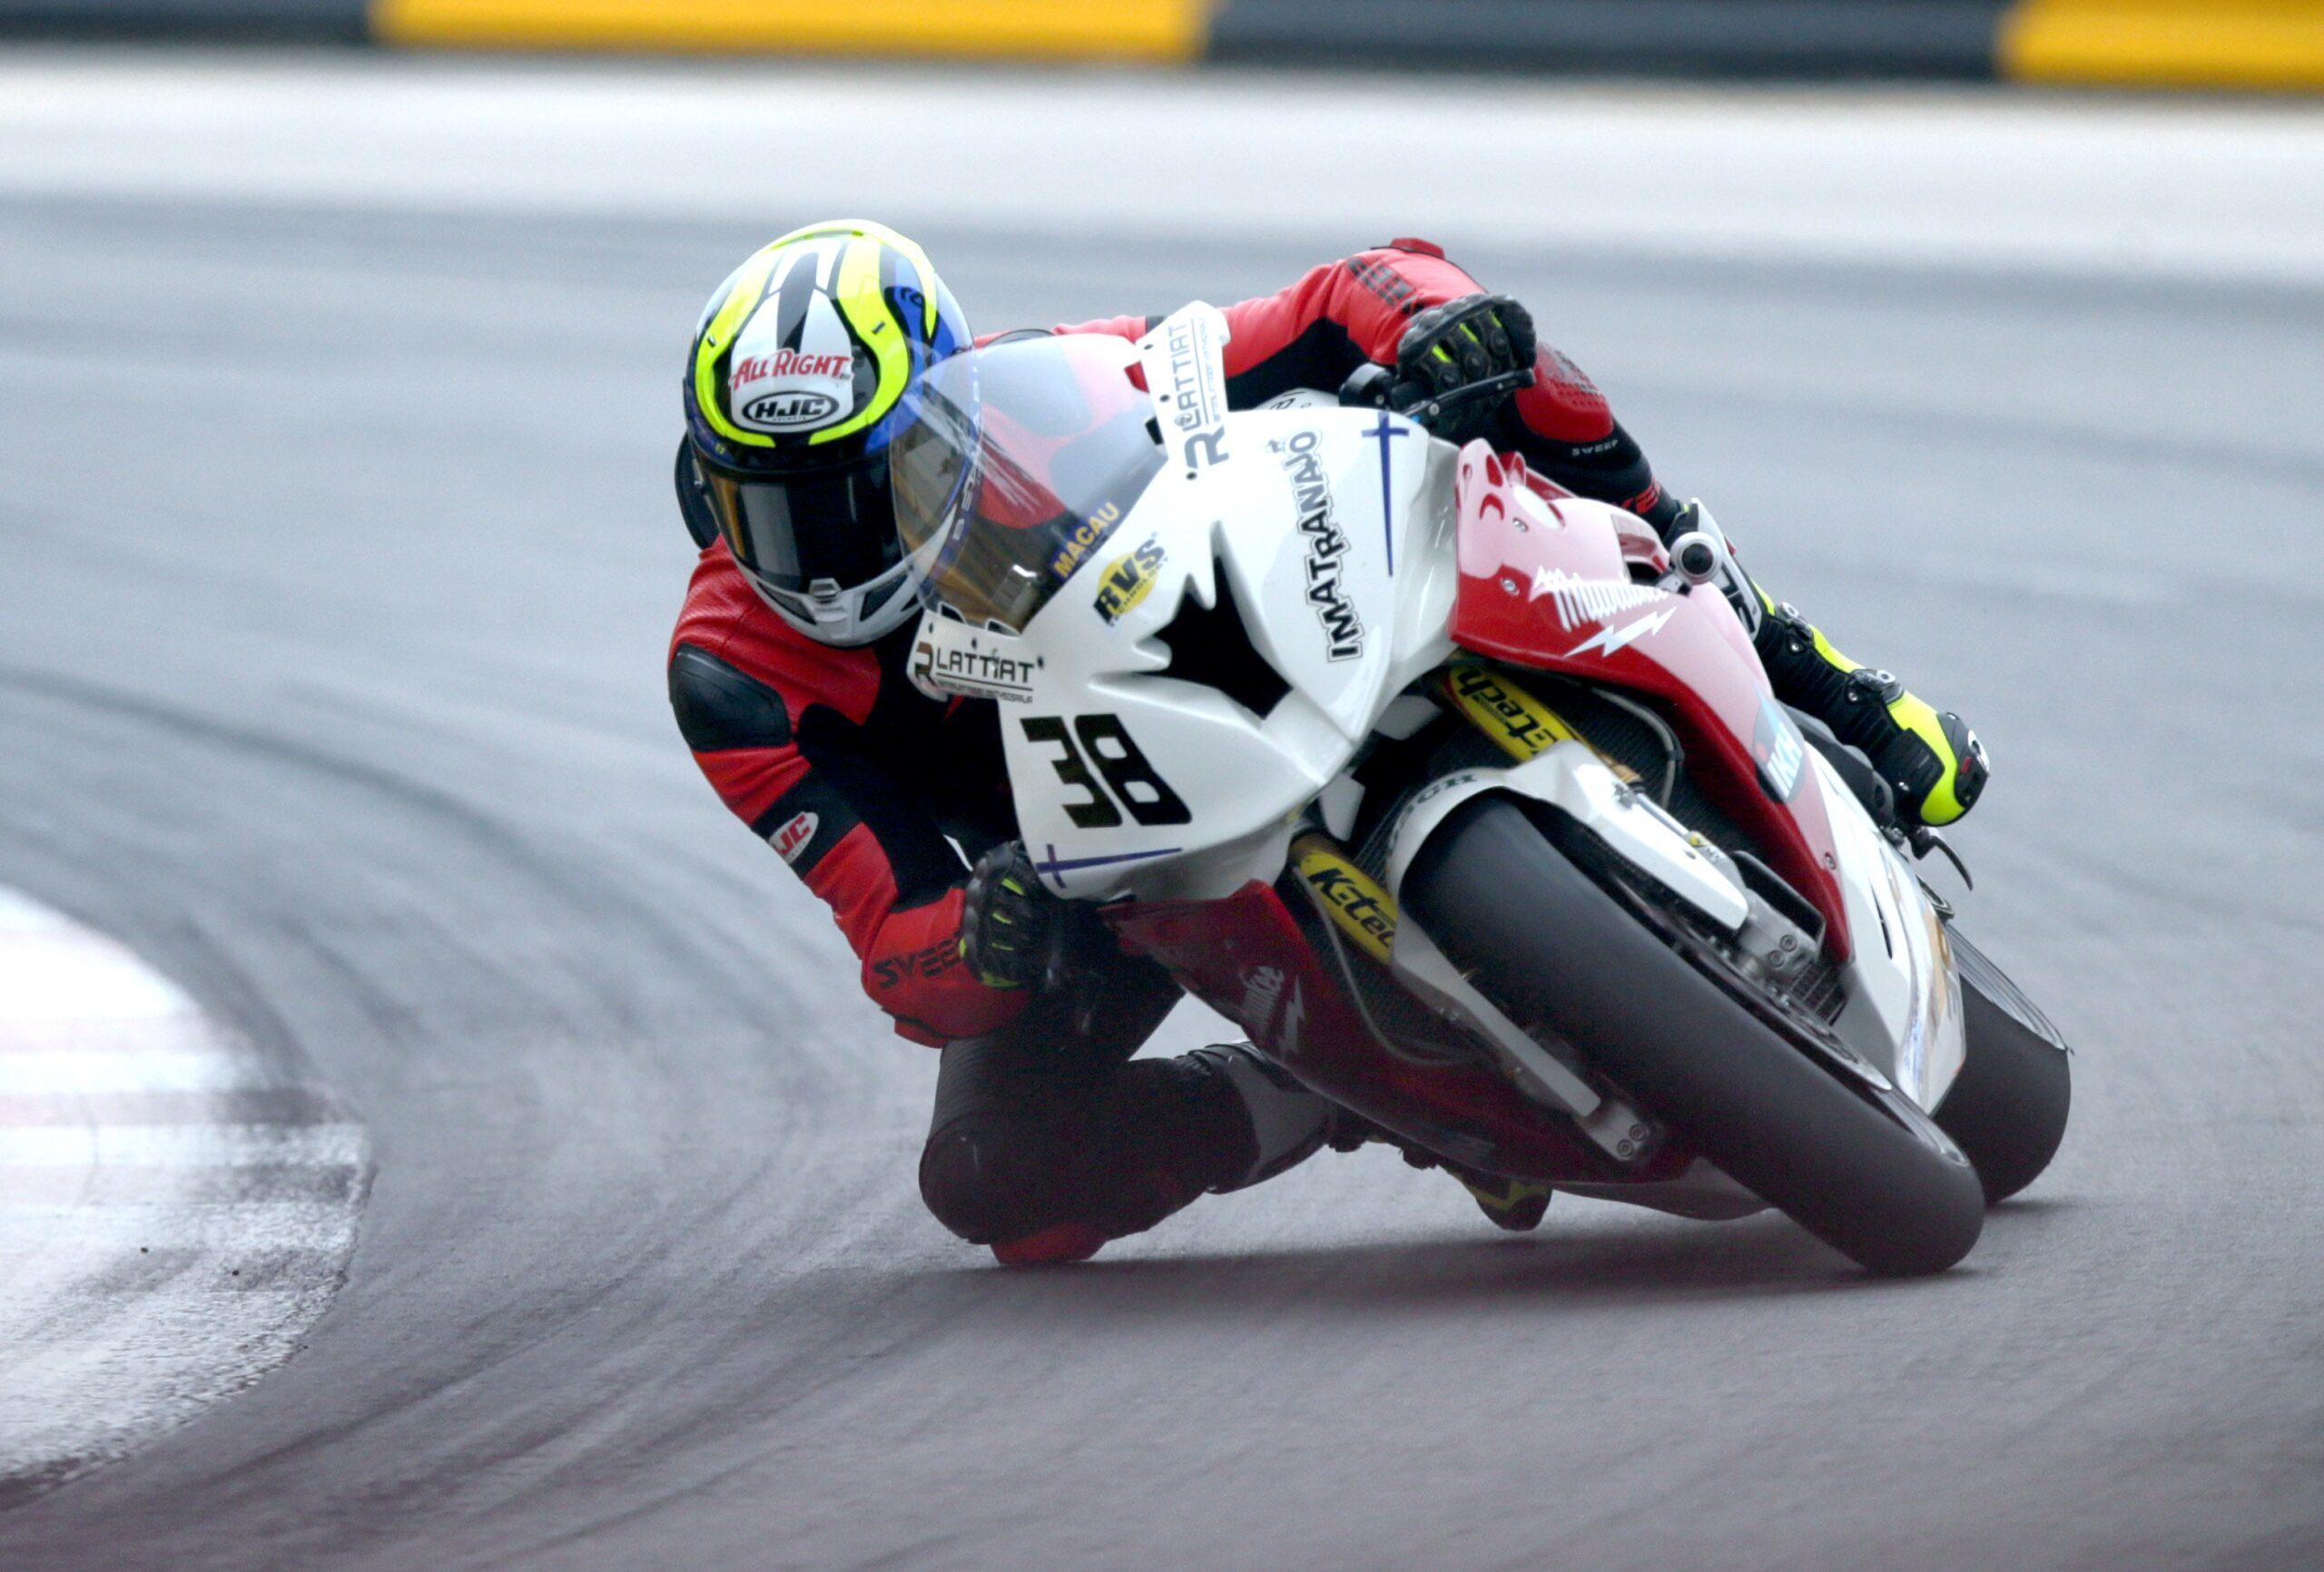 Second Macau GP Venture On Horizon For Finland's Leading IRRC Exponent